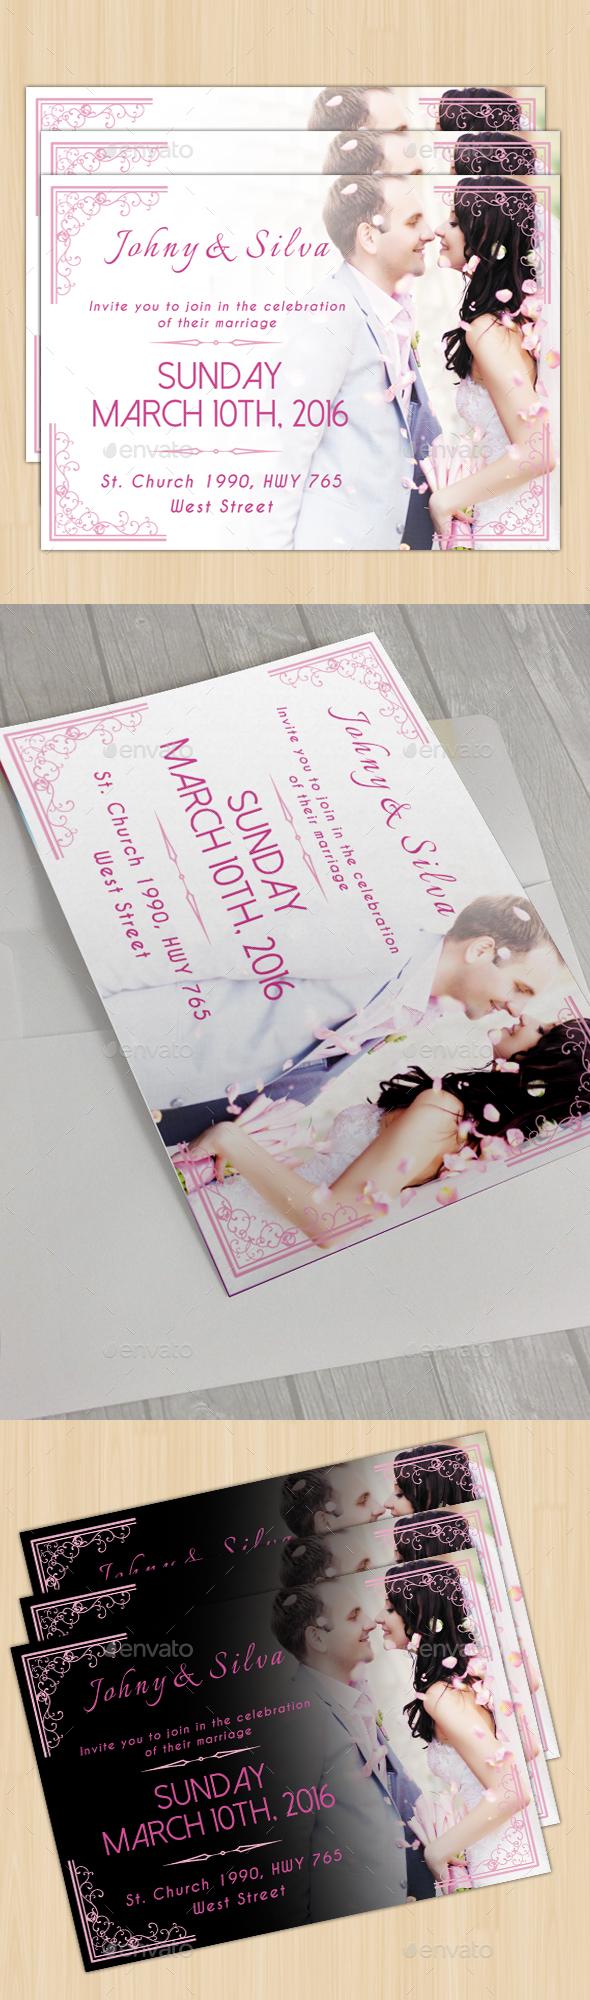 Modern Wedding Card II - Weddings Cards & Invites